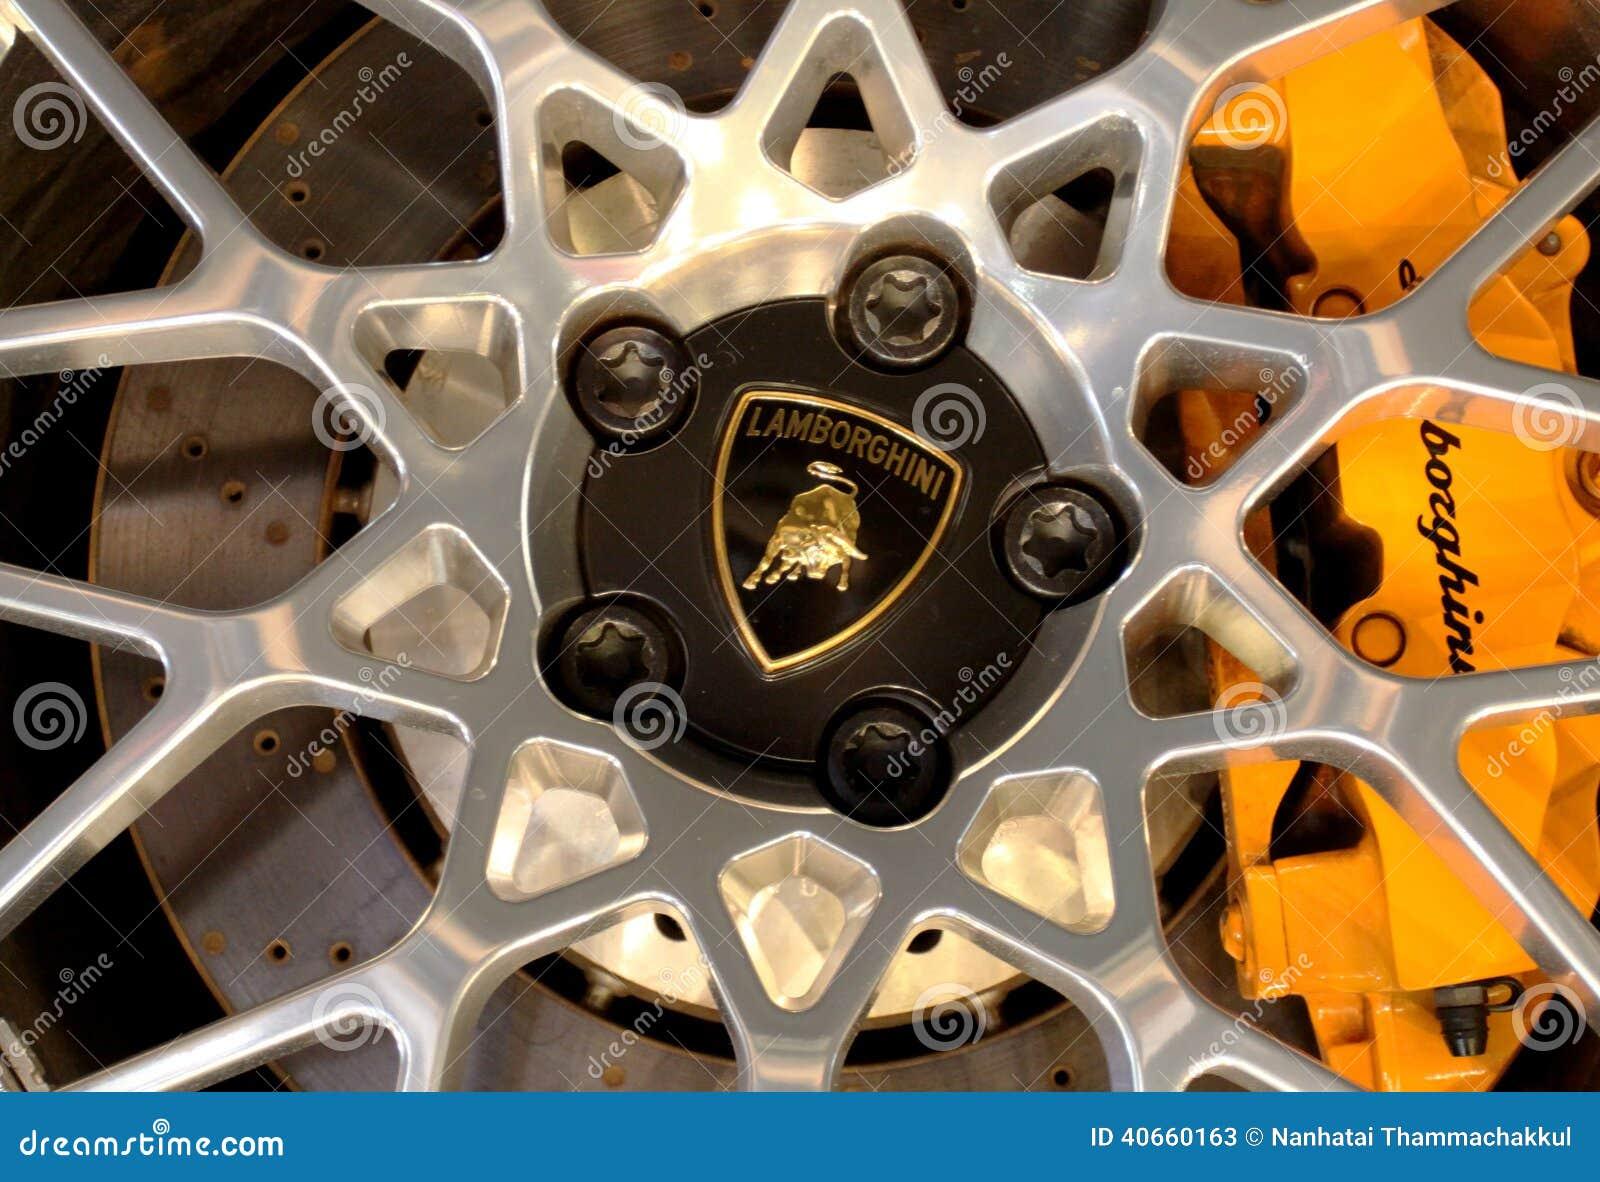 Embleem van Lamborghini op wielen